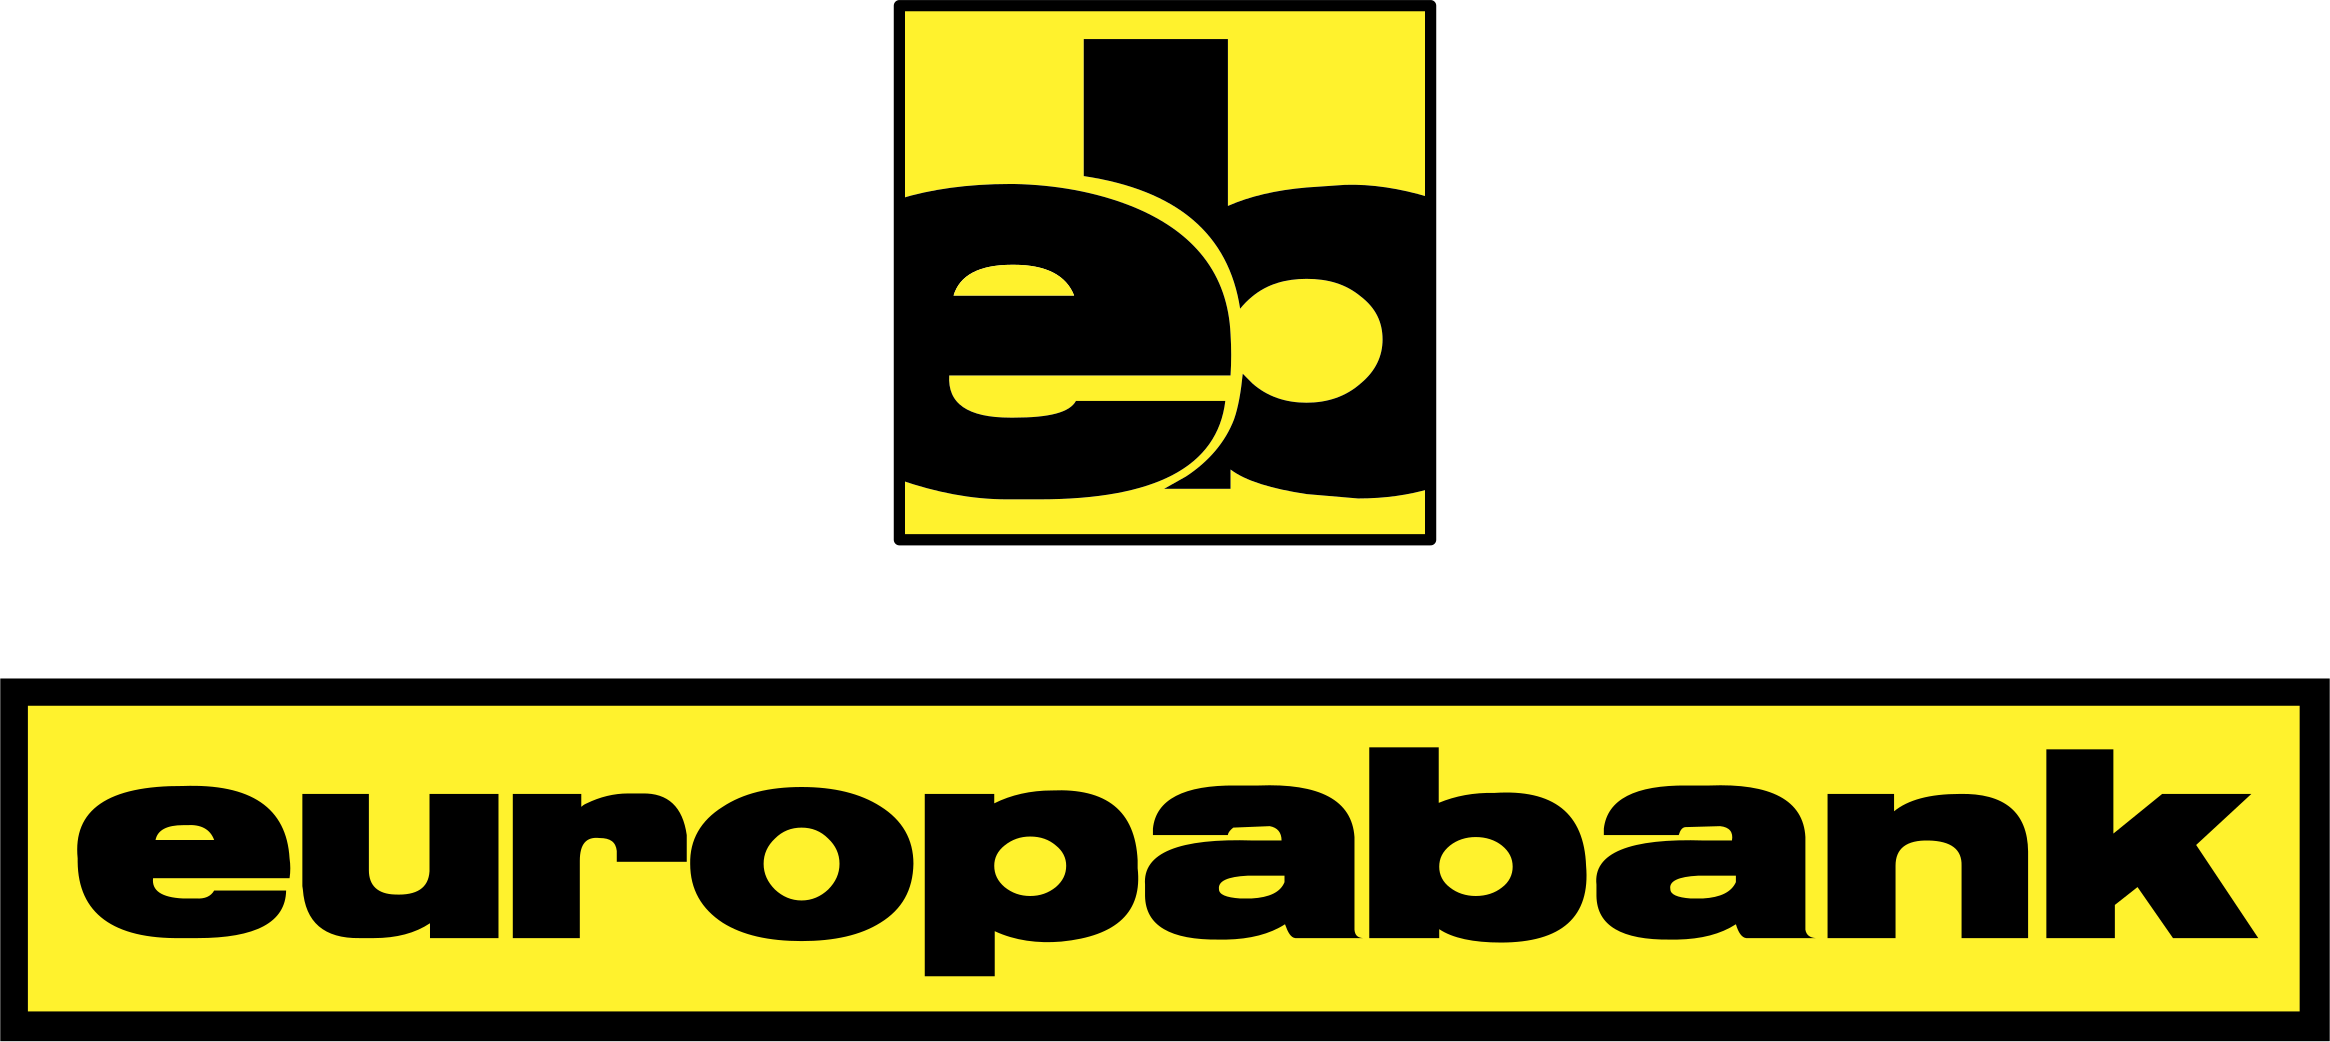 europabank-logo-png-transparent